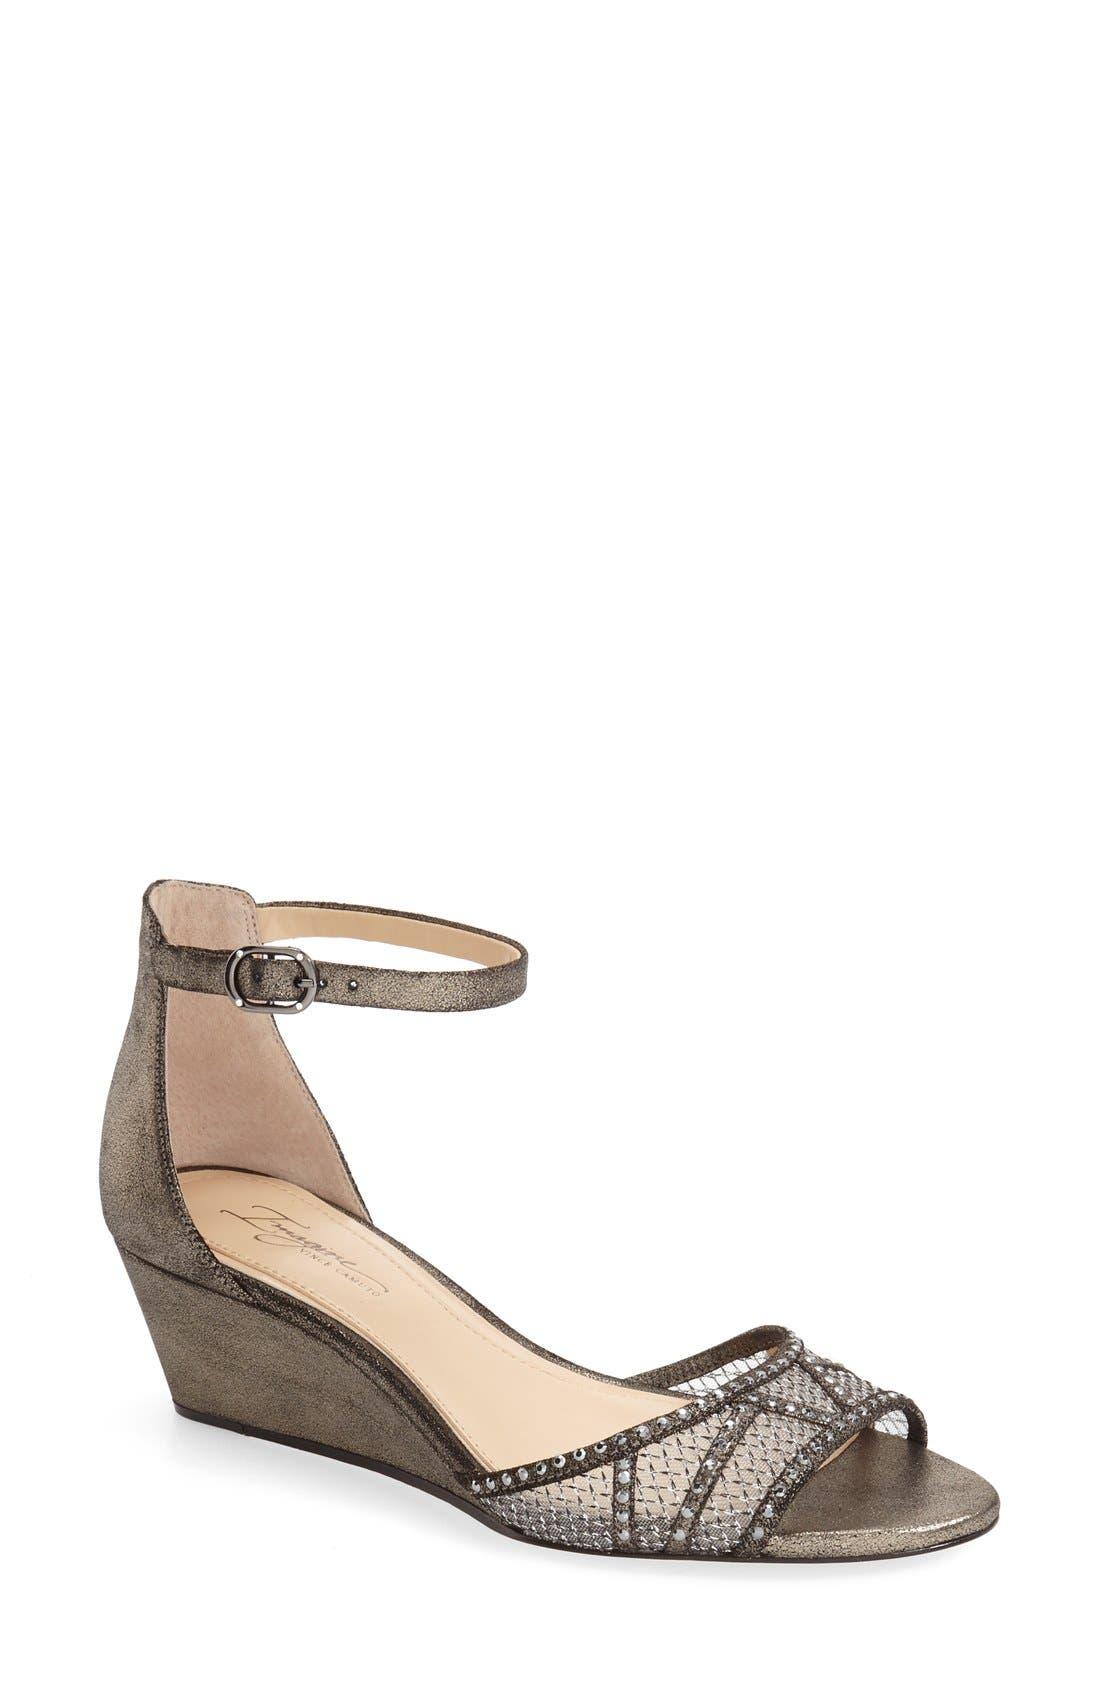 'Joan' Studded Wedge Sandal,                             Main thumbnail 1, color,